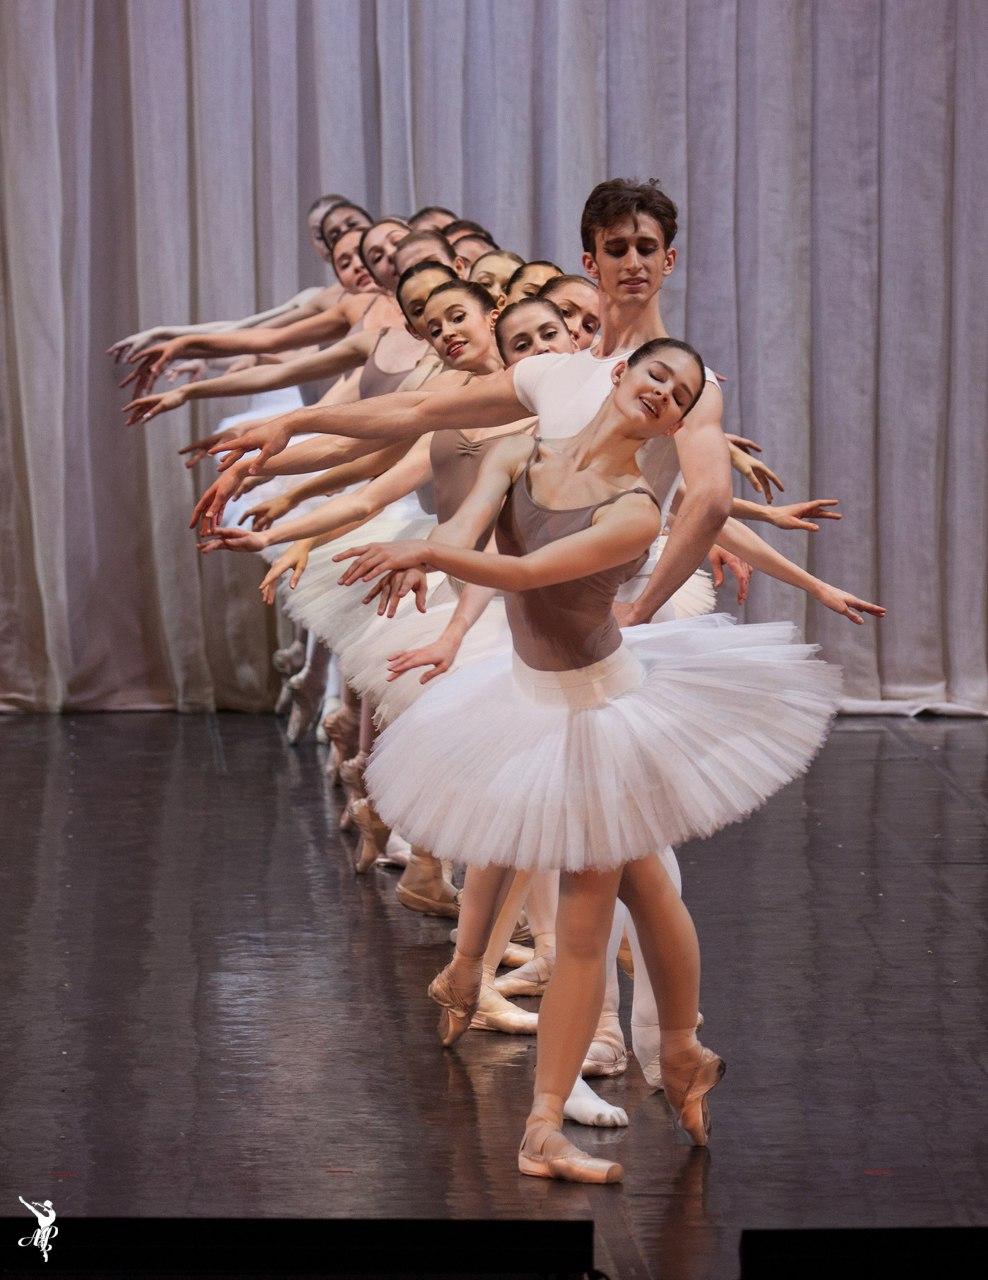 http://vaganovaacademy.ru/vaganova/news/photo/2017.05.11_Hermitage_theatre/Paquita-3.jpg